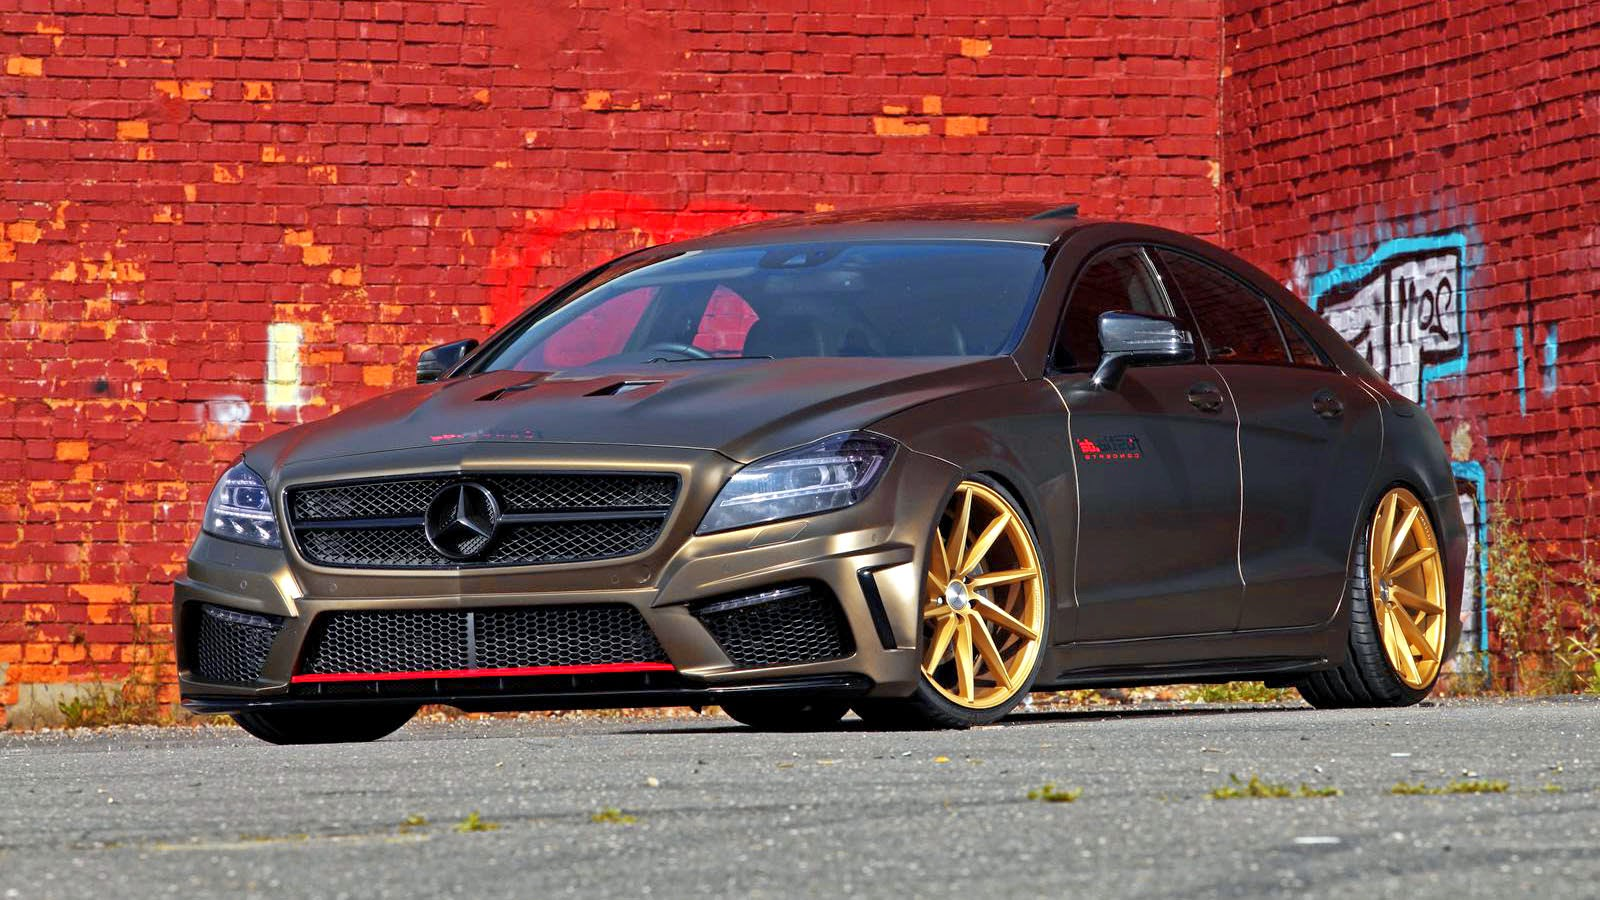 Mercedes-Benz CLS 350 CDI Modified